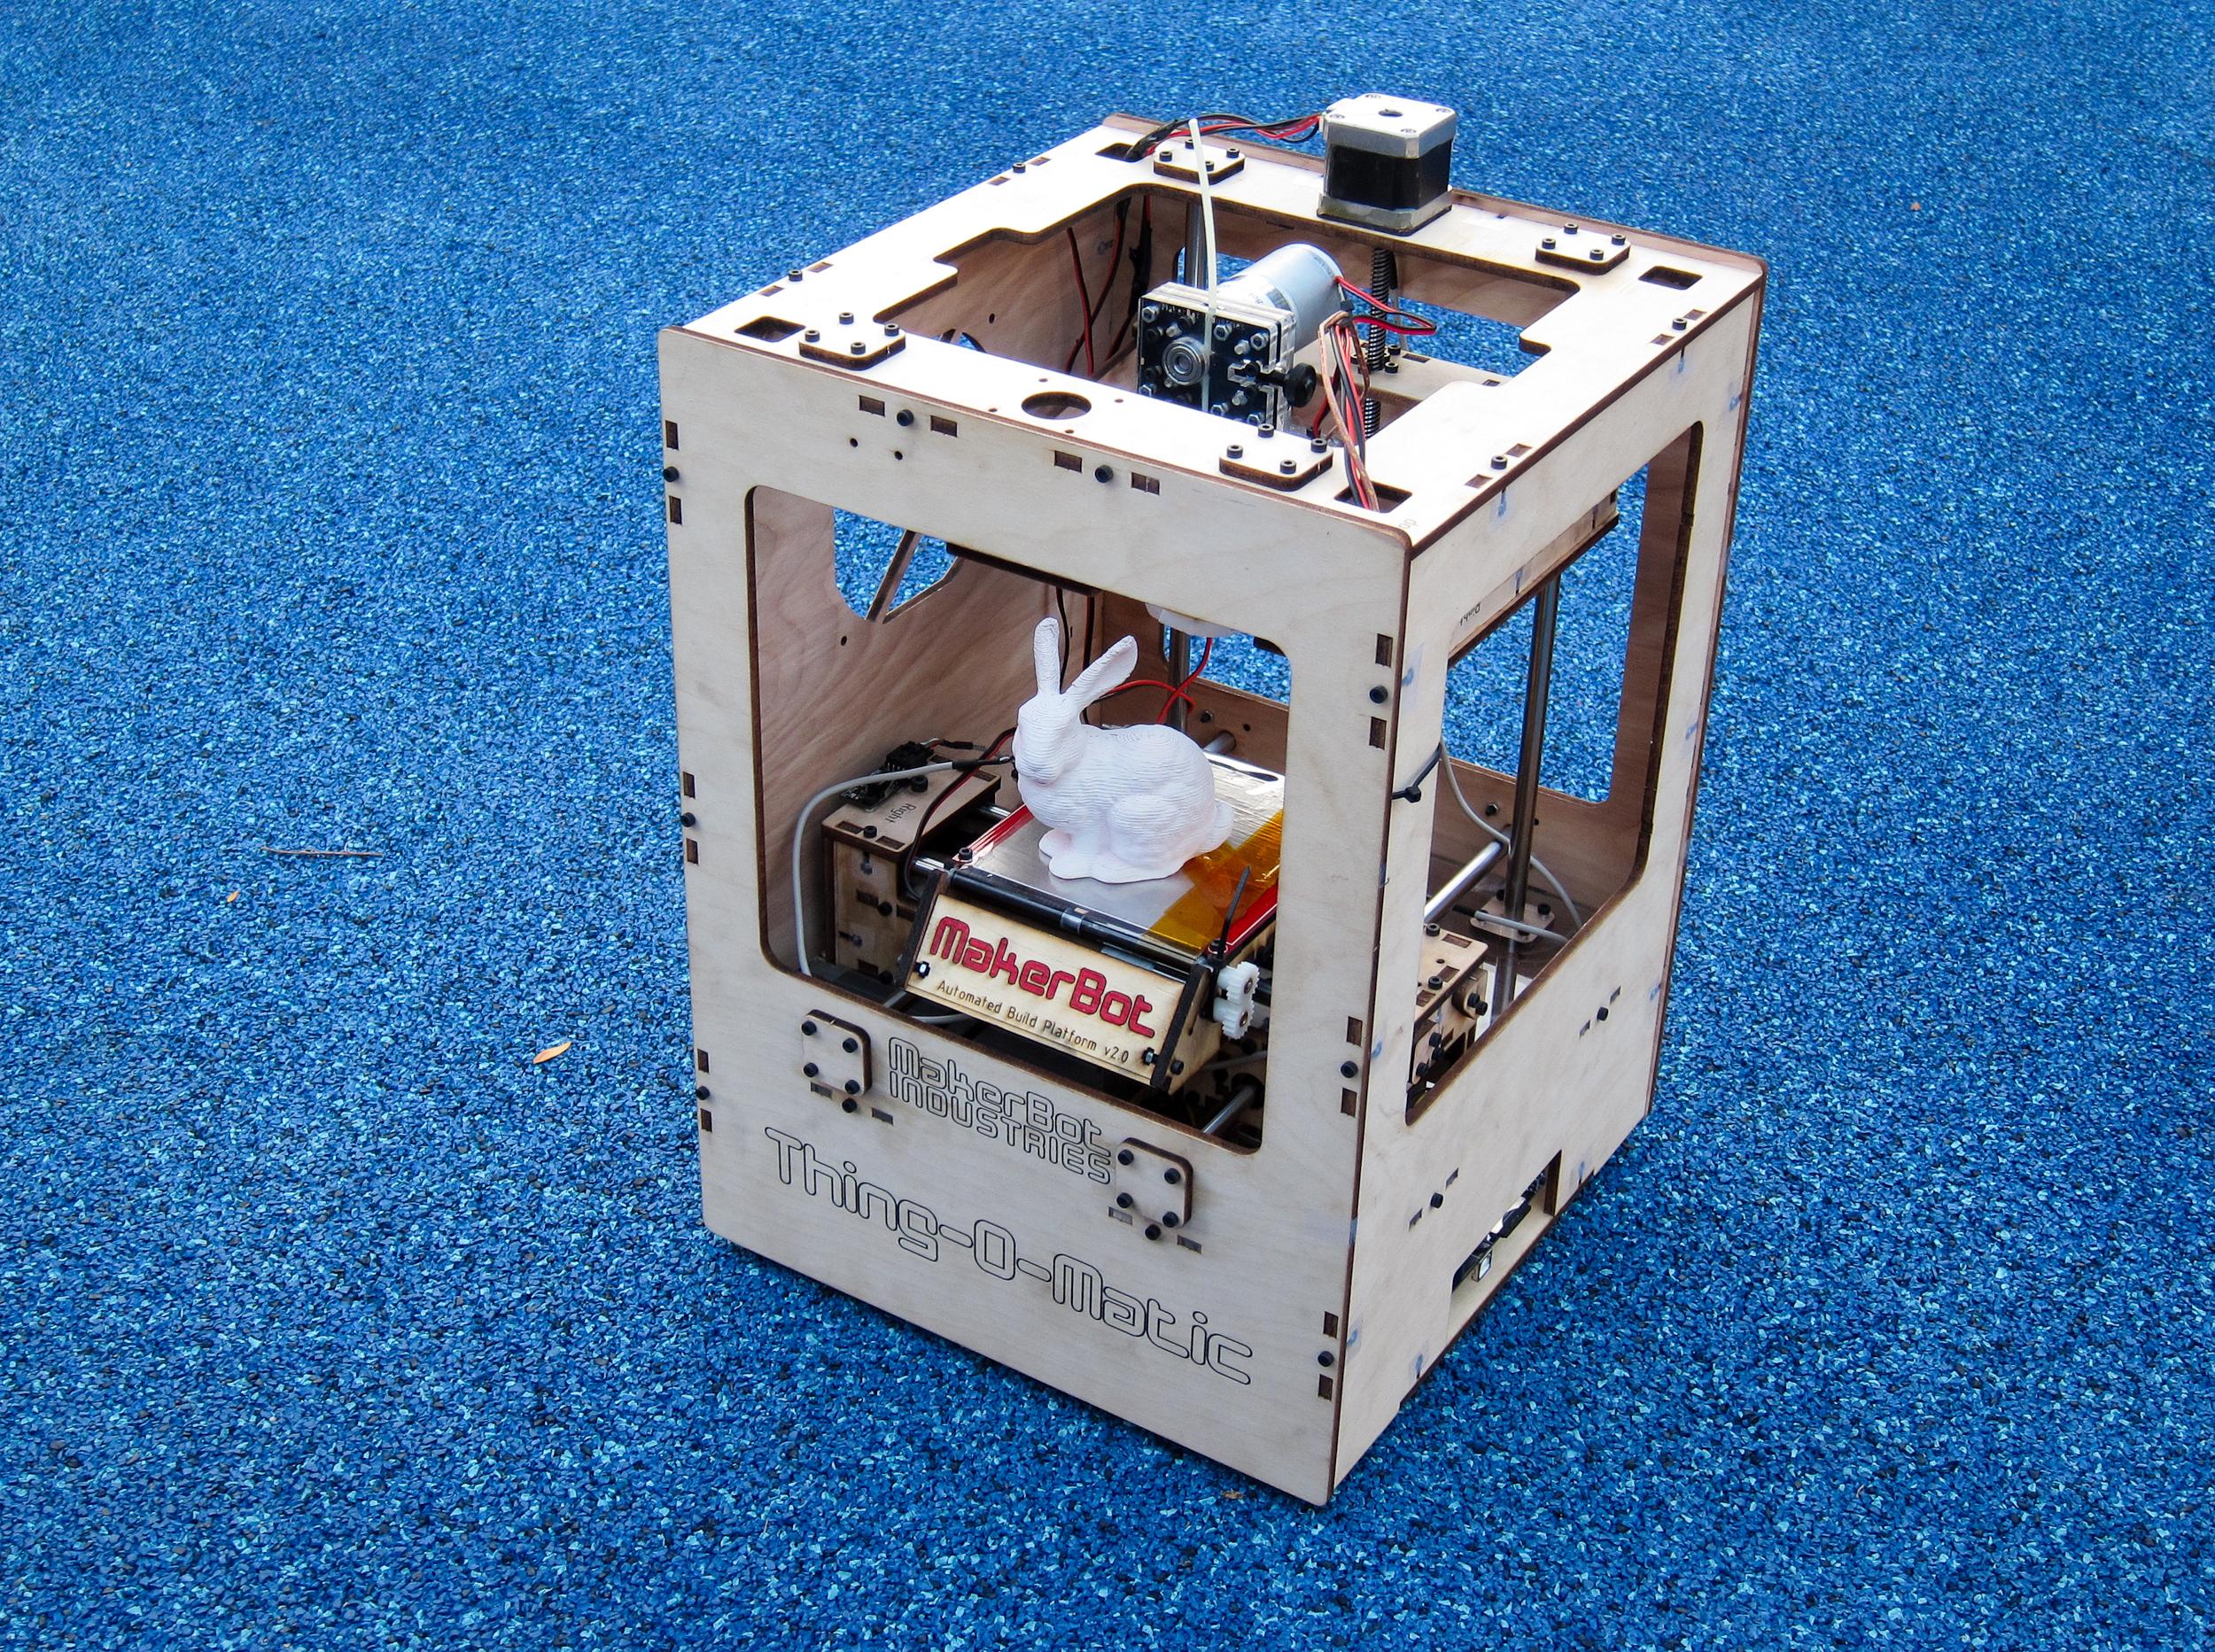 Thing-o-matic 3d printer by makerbot thingiverse.